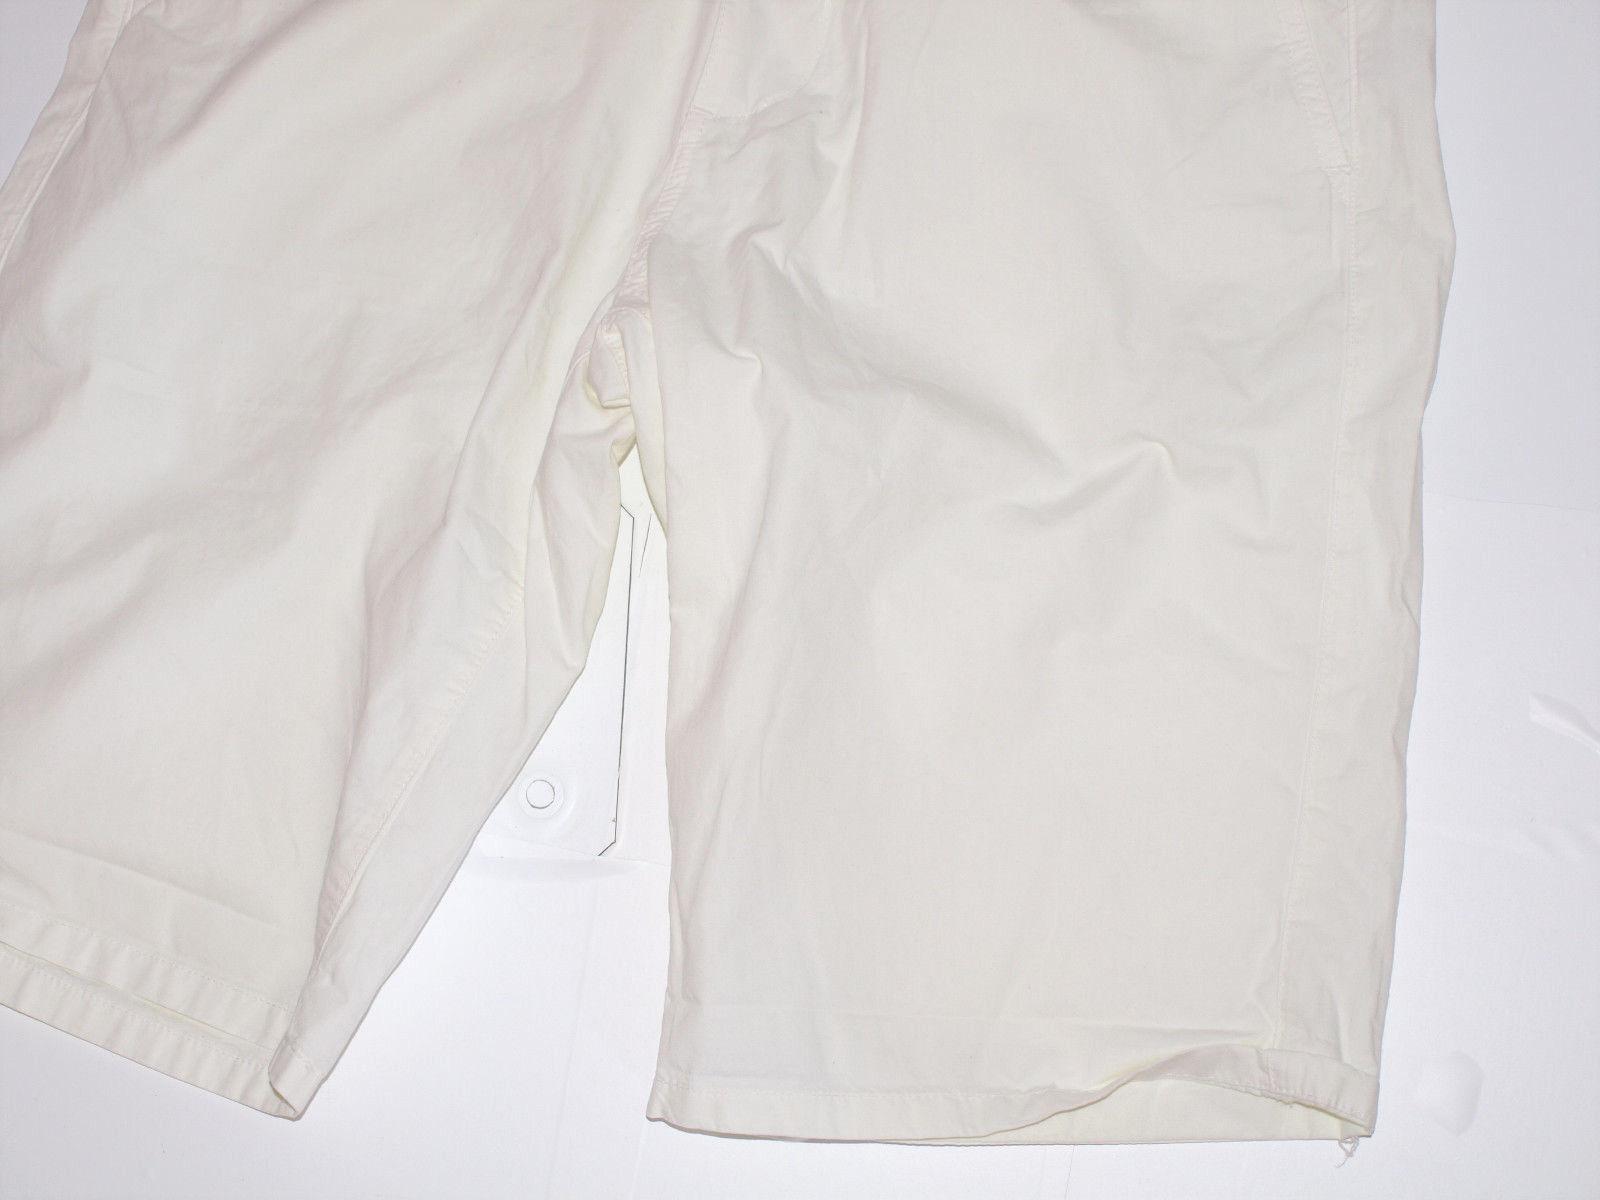 ESPRIT bermuda 057ee2c045 Basic Chino Shorts Relaxed Fit (w32) Neuf 100 100 Neuf ccae14